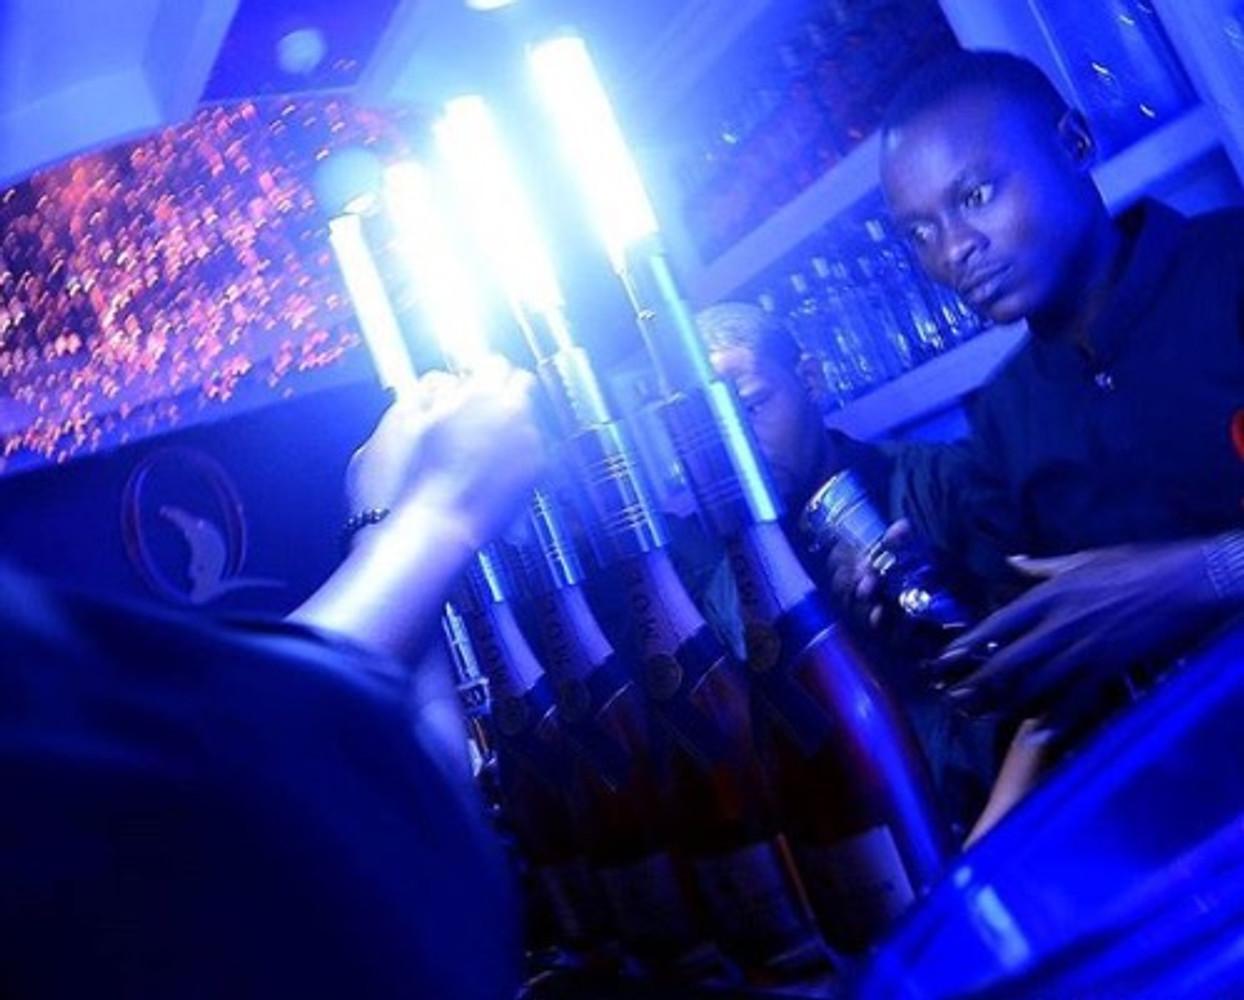 LED strobe baton Topper,LED, Strobe, Baton, Bottle, Strobe,champagne,Bottle Service,delivery,Sparks,Flash,baton, Top, Topper, attachment,LED Sparkler, electronic, alternative,electronic sparkler,champagne bottle sparkler, champagne, liquor,flashing, light